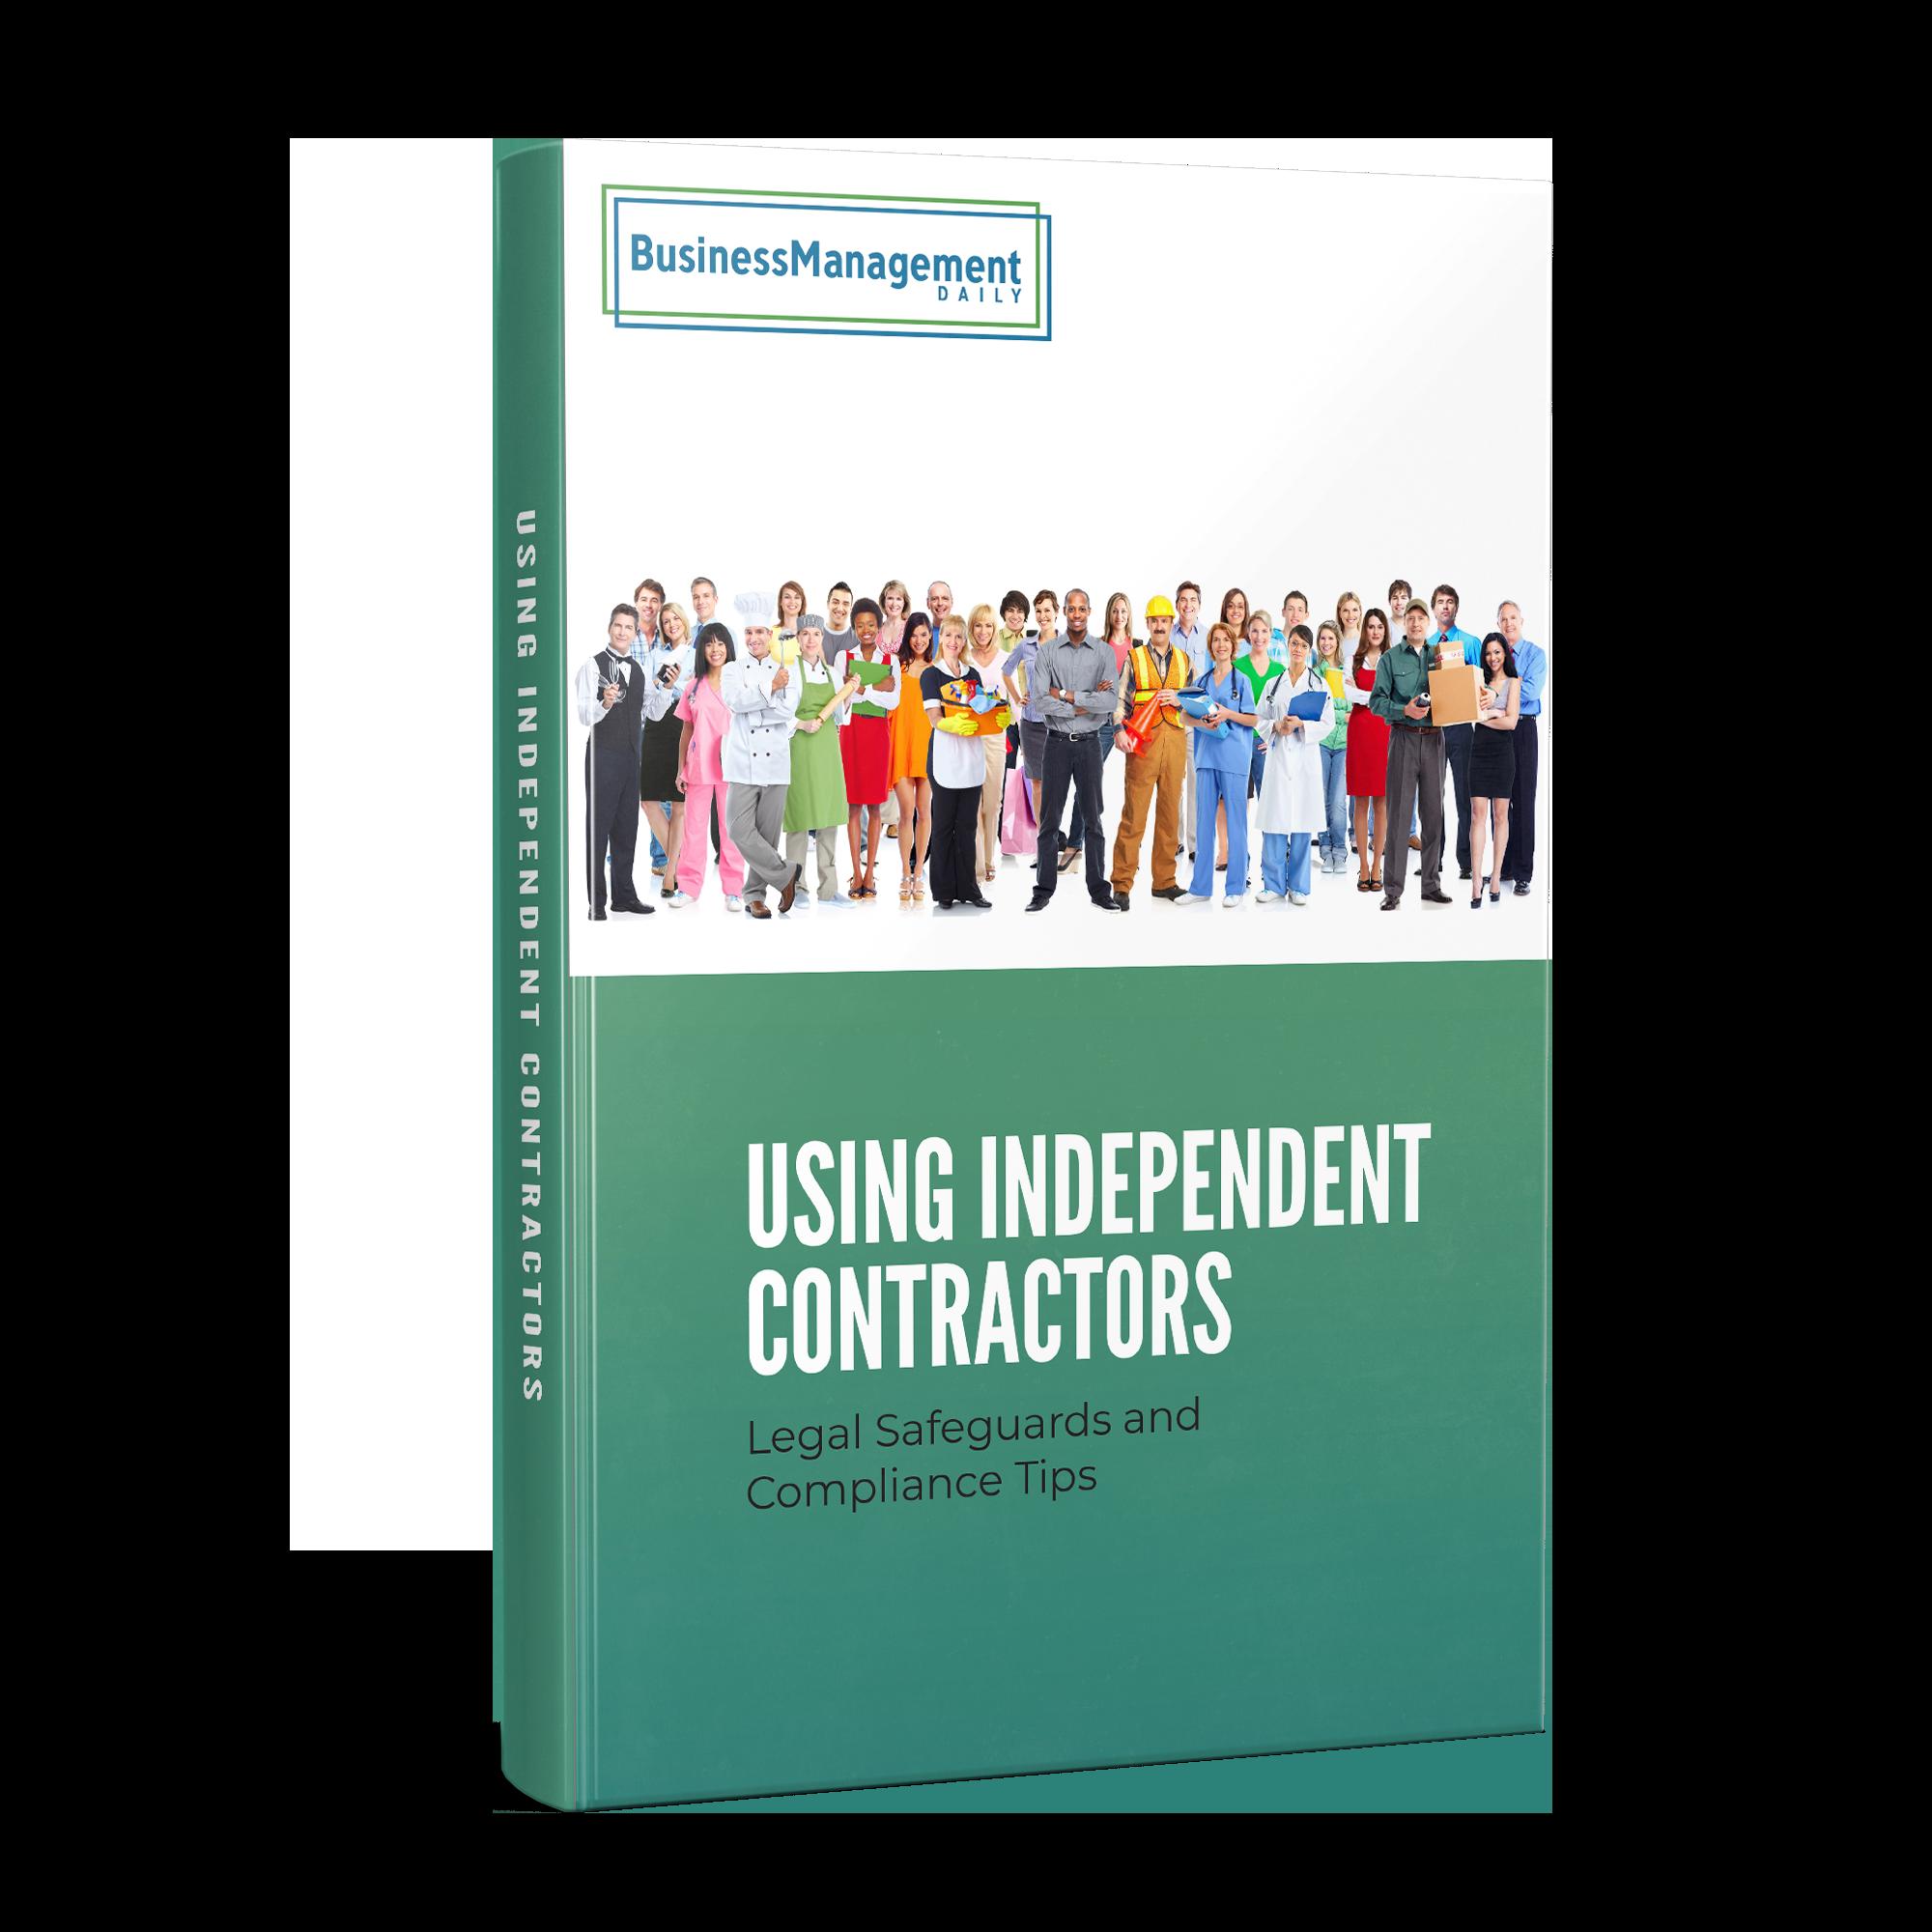 Using Independent Contractors